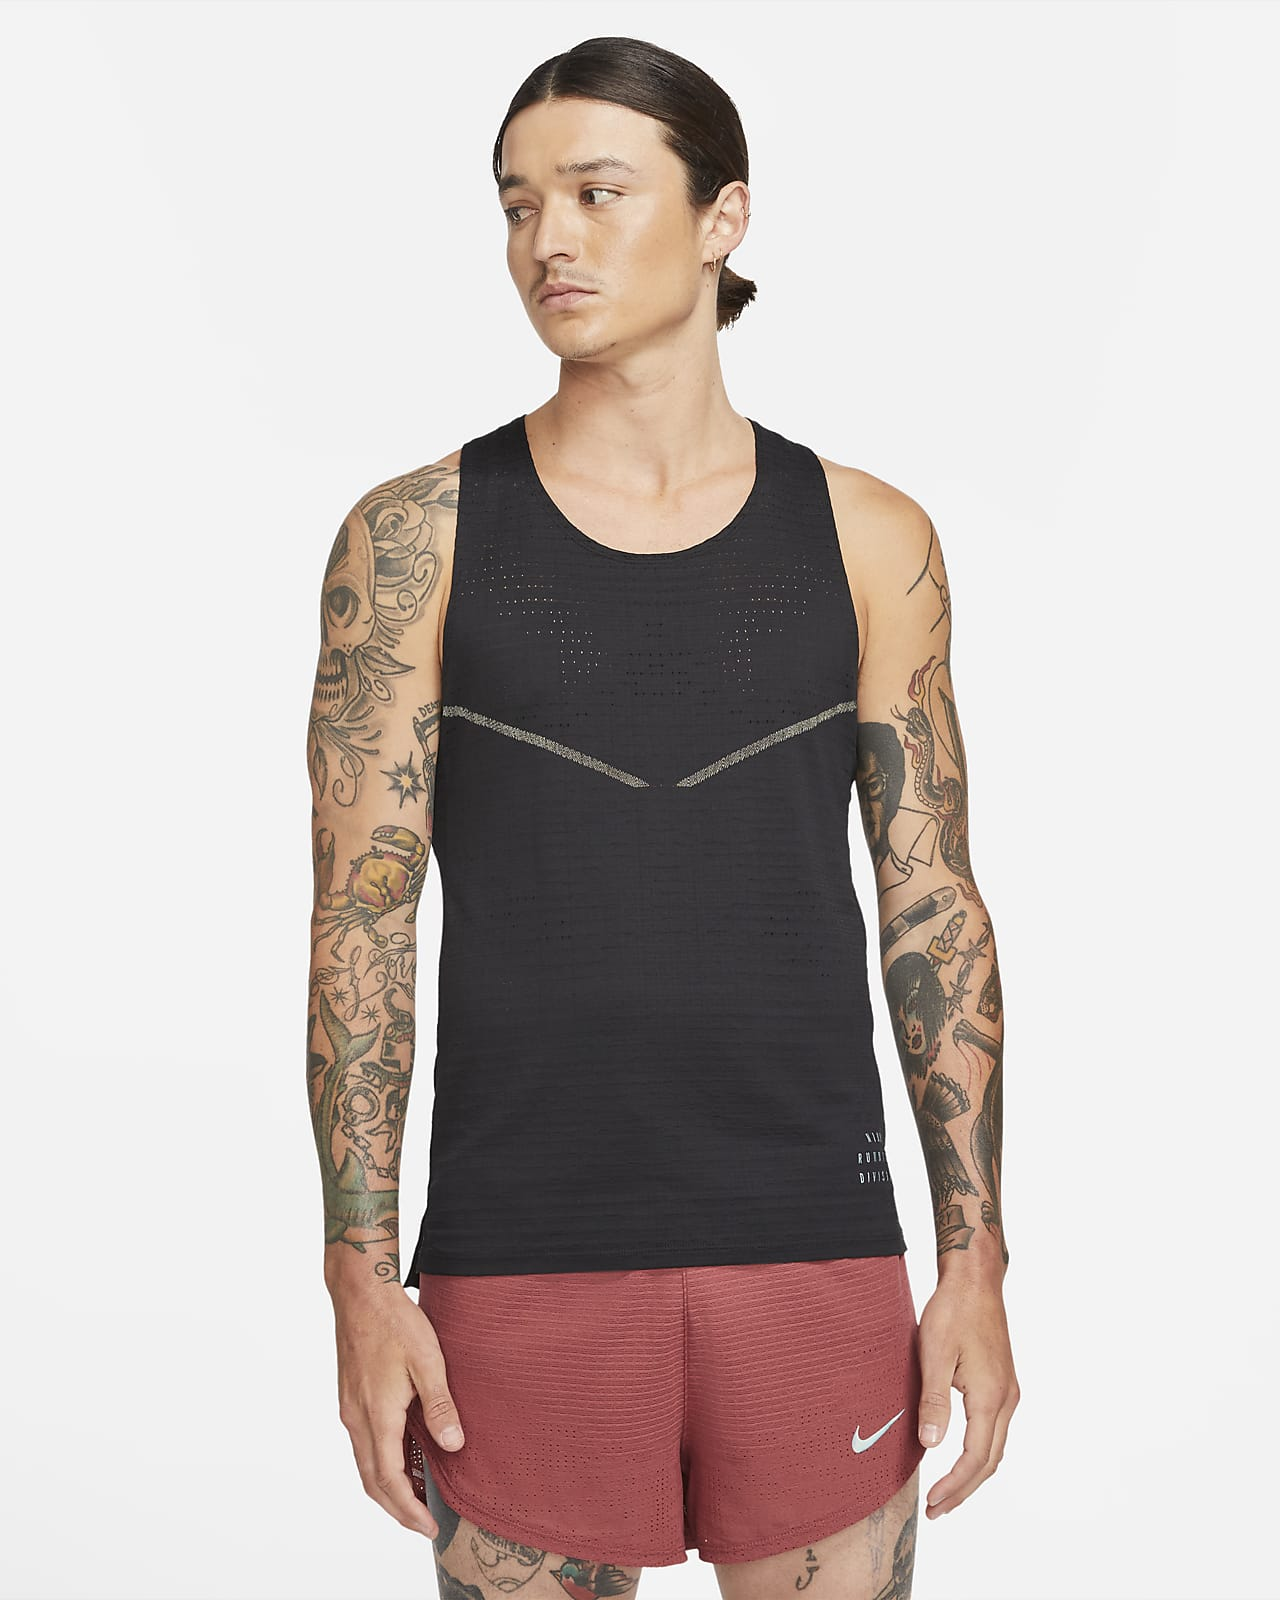 Camiseta de tirantes de running para hombre Nike Dri-FIT ADV Run Division